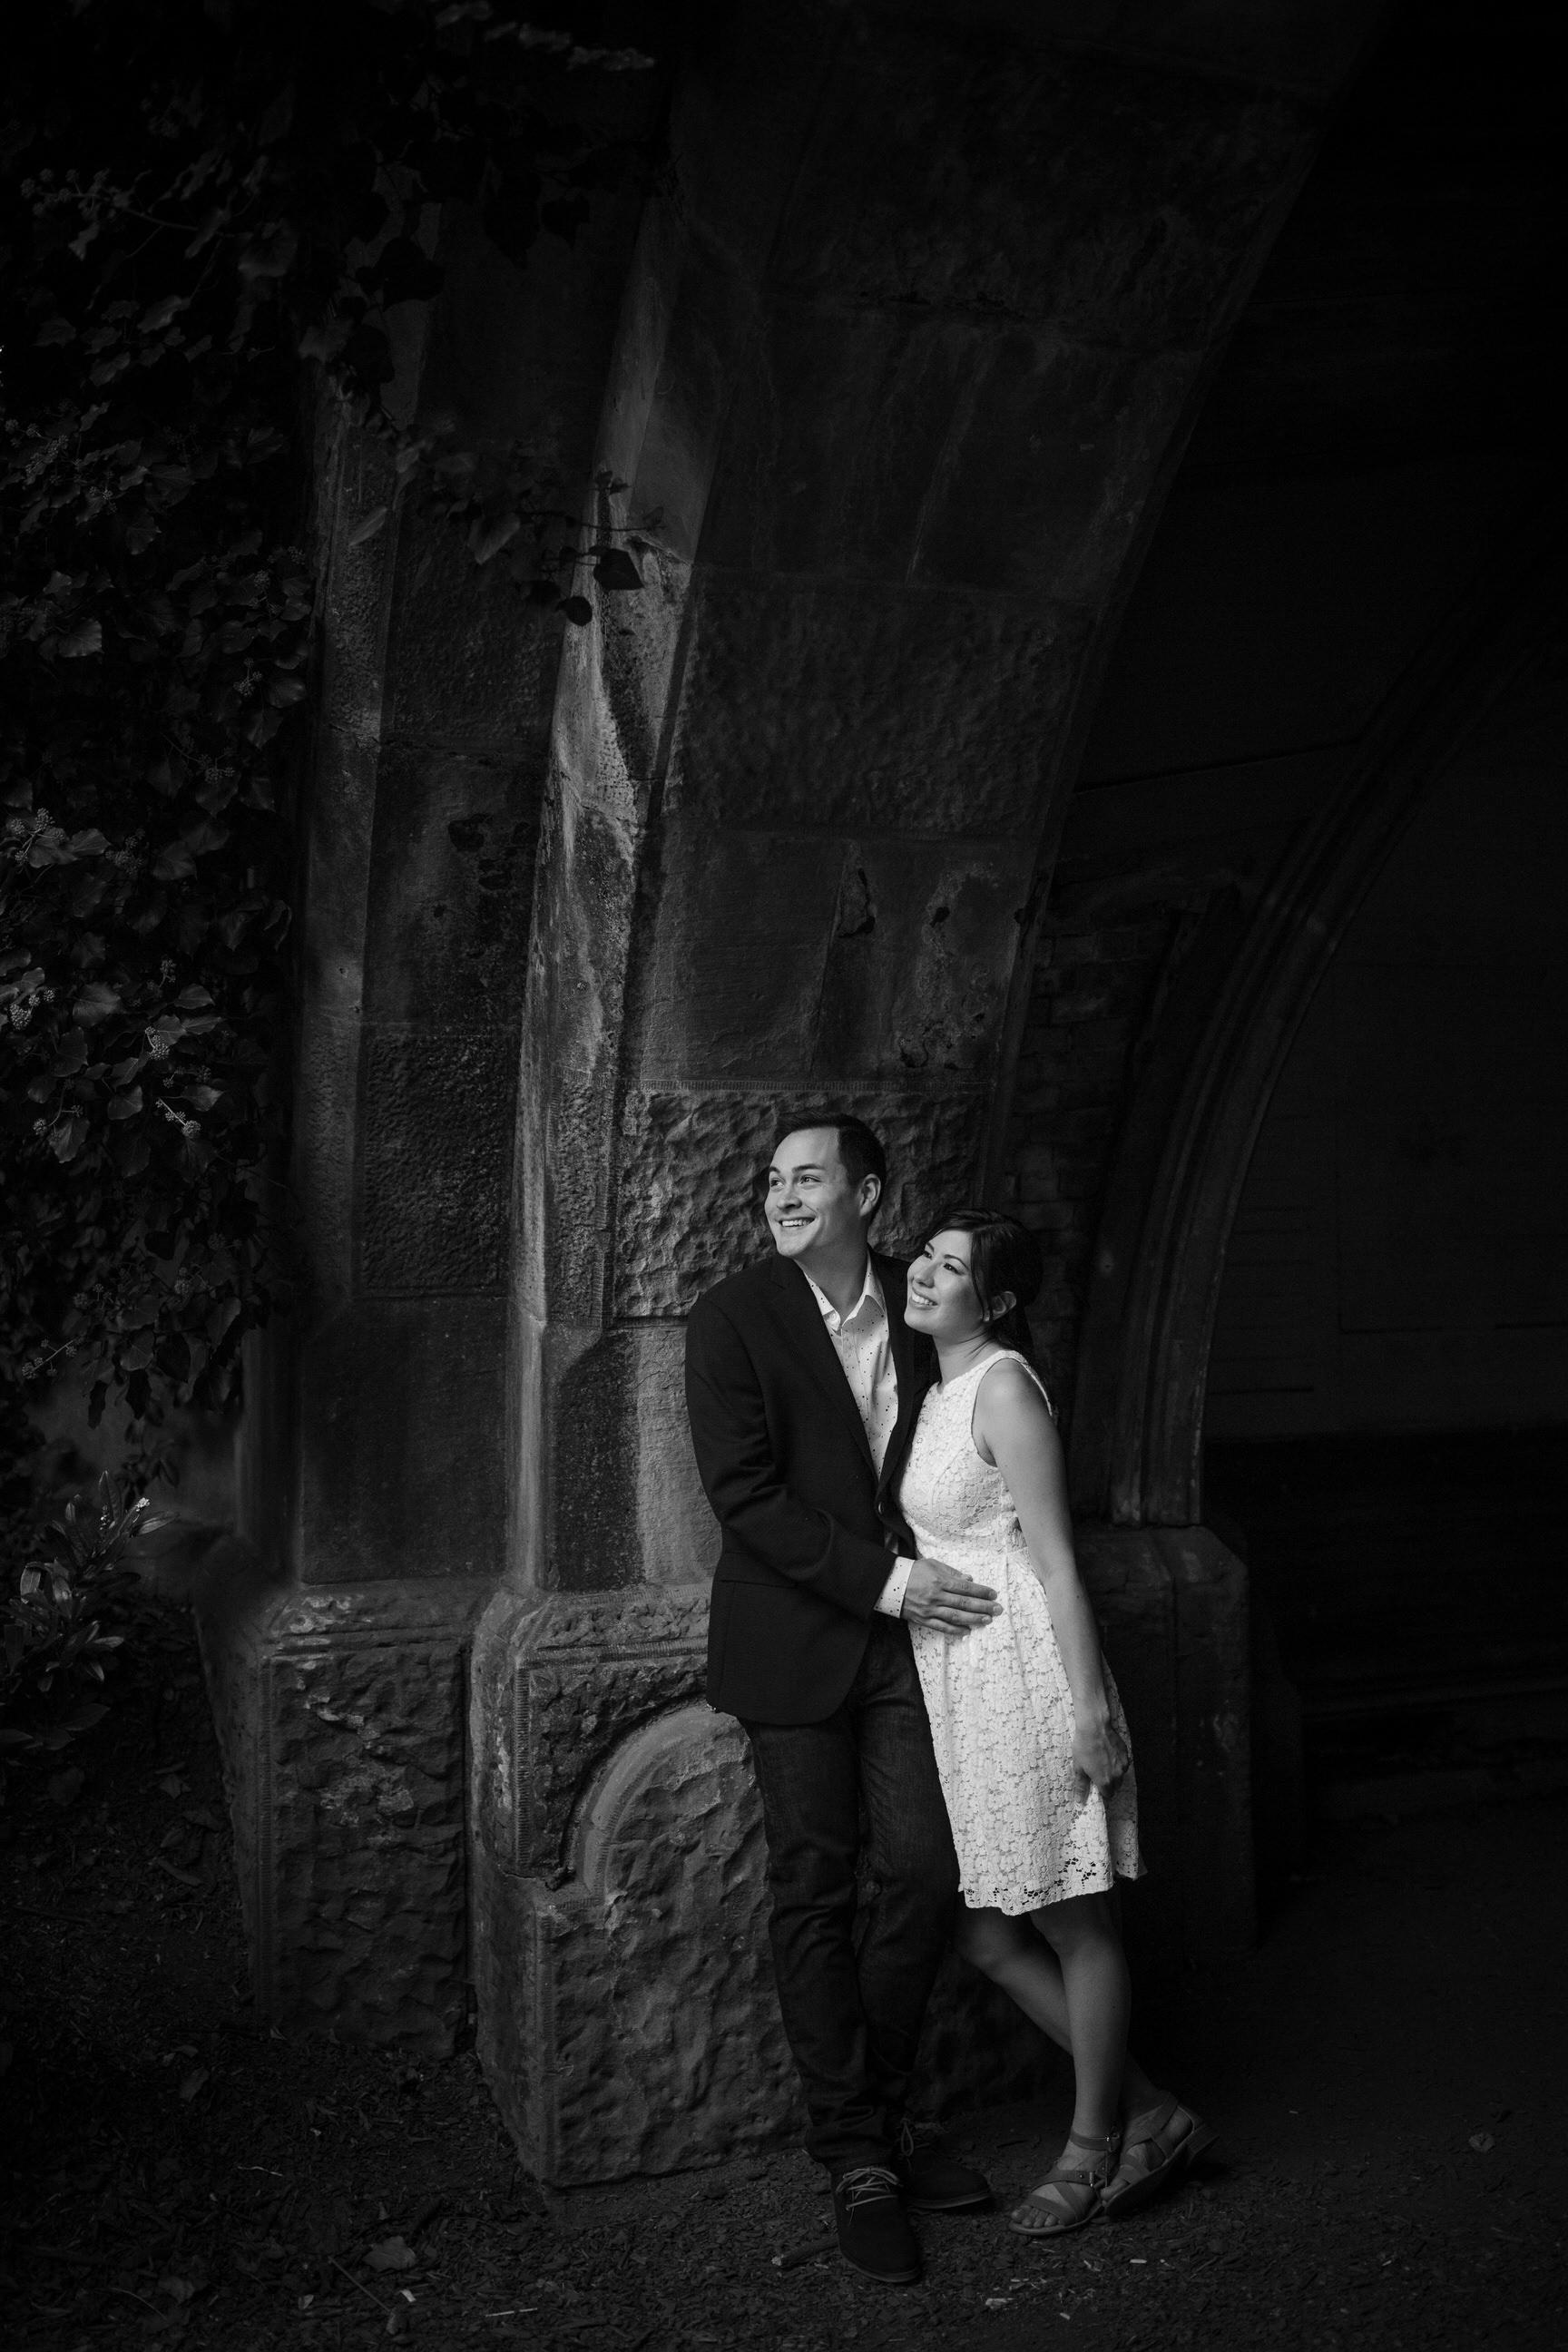 black_and_white_timeless_engagement_portraits_tiny_house_photo_love_emotion_international_wedding_photographer.jpg